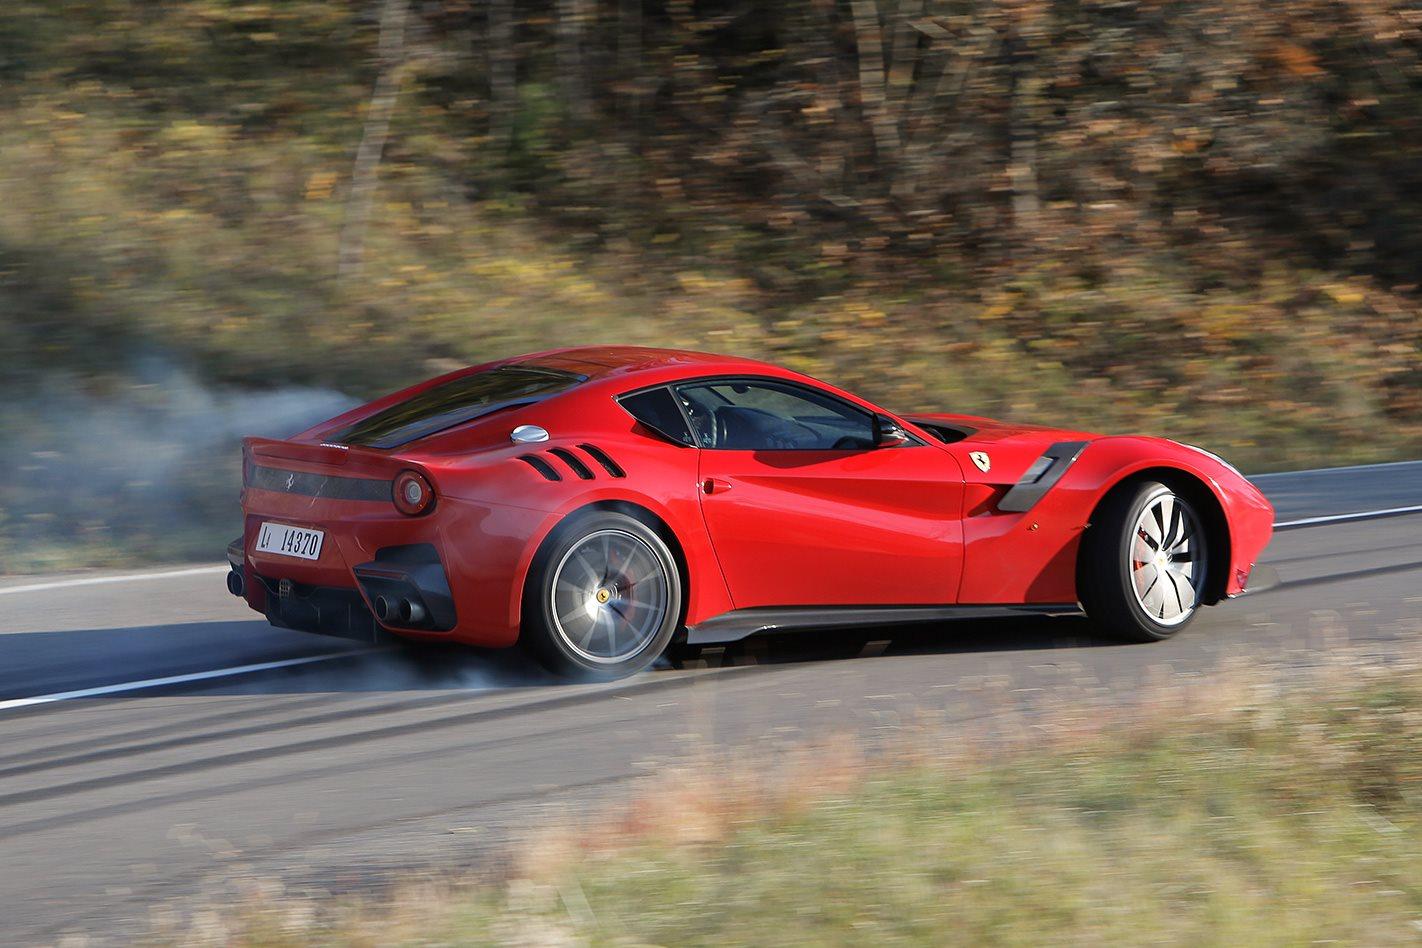 Aventador >> 2016 Ferrari F12 tdf review | Wheels